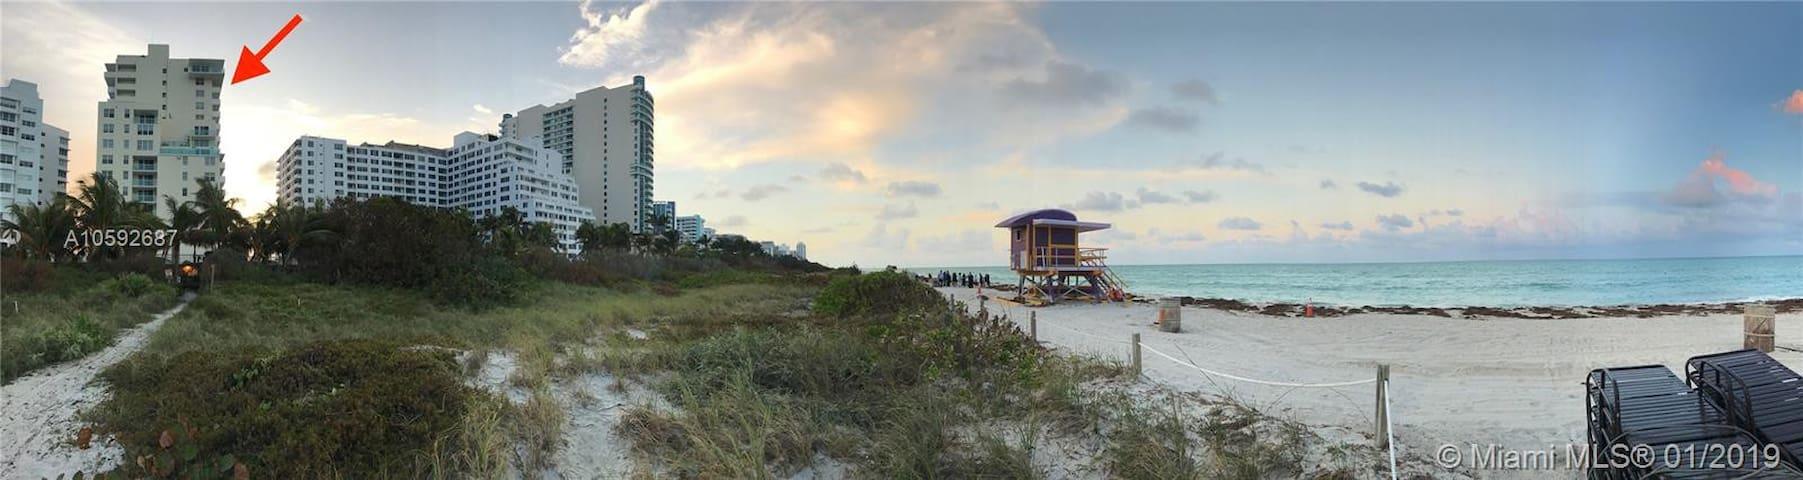 Stunning Beach Apartment!